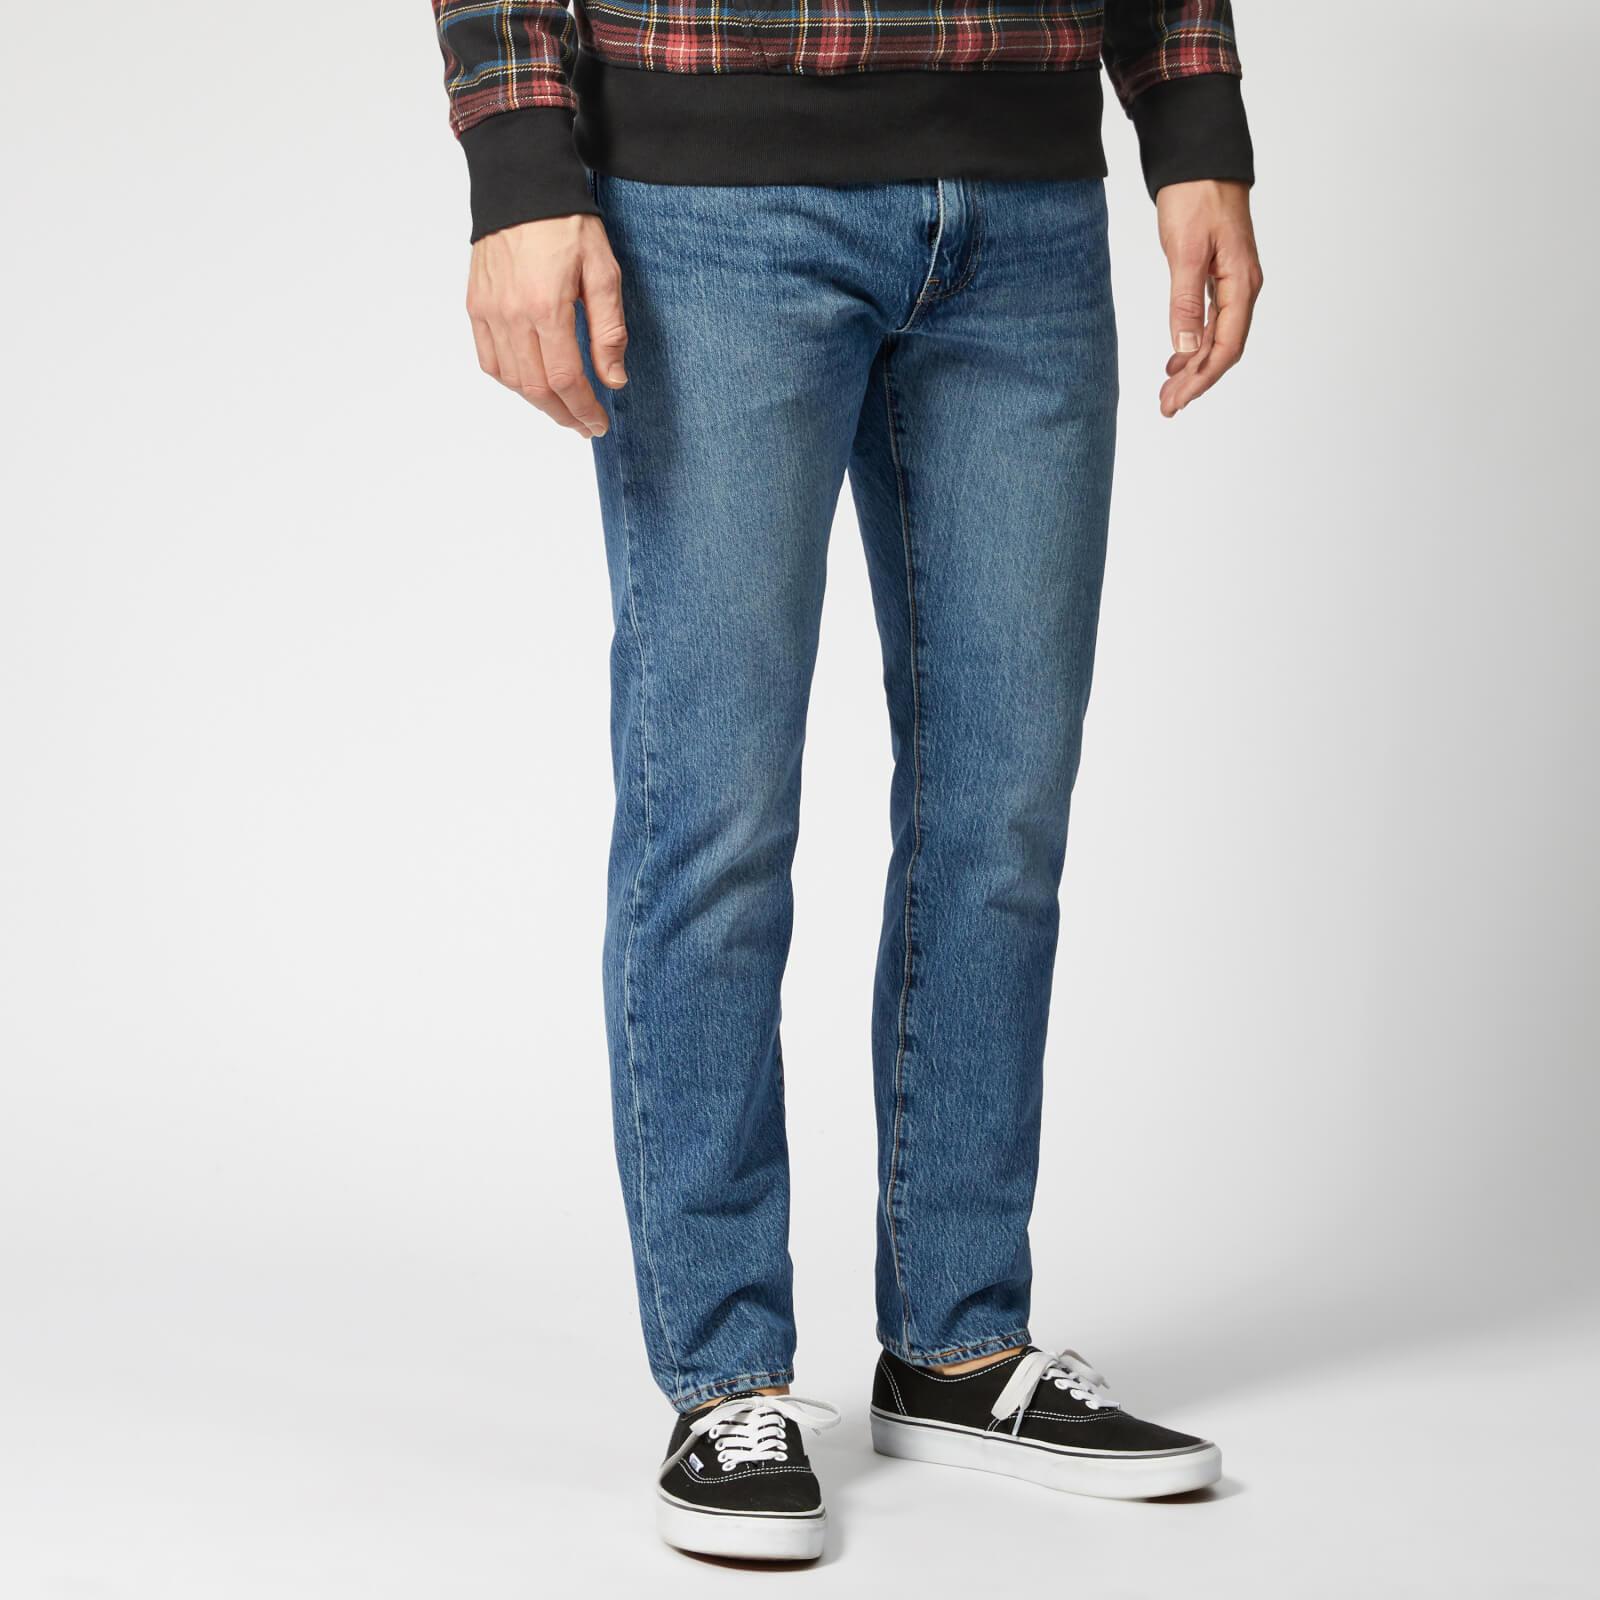 b668e6581e Levi s Men s 512 Slim Taper Fit Jeans - Marcel Dark Mens Clothing ...